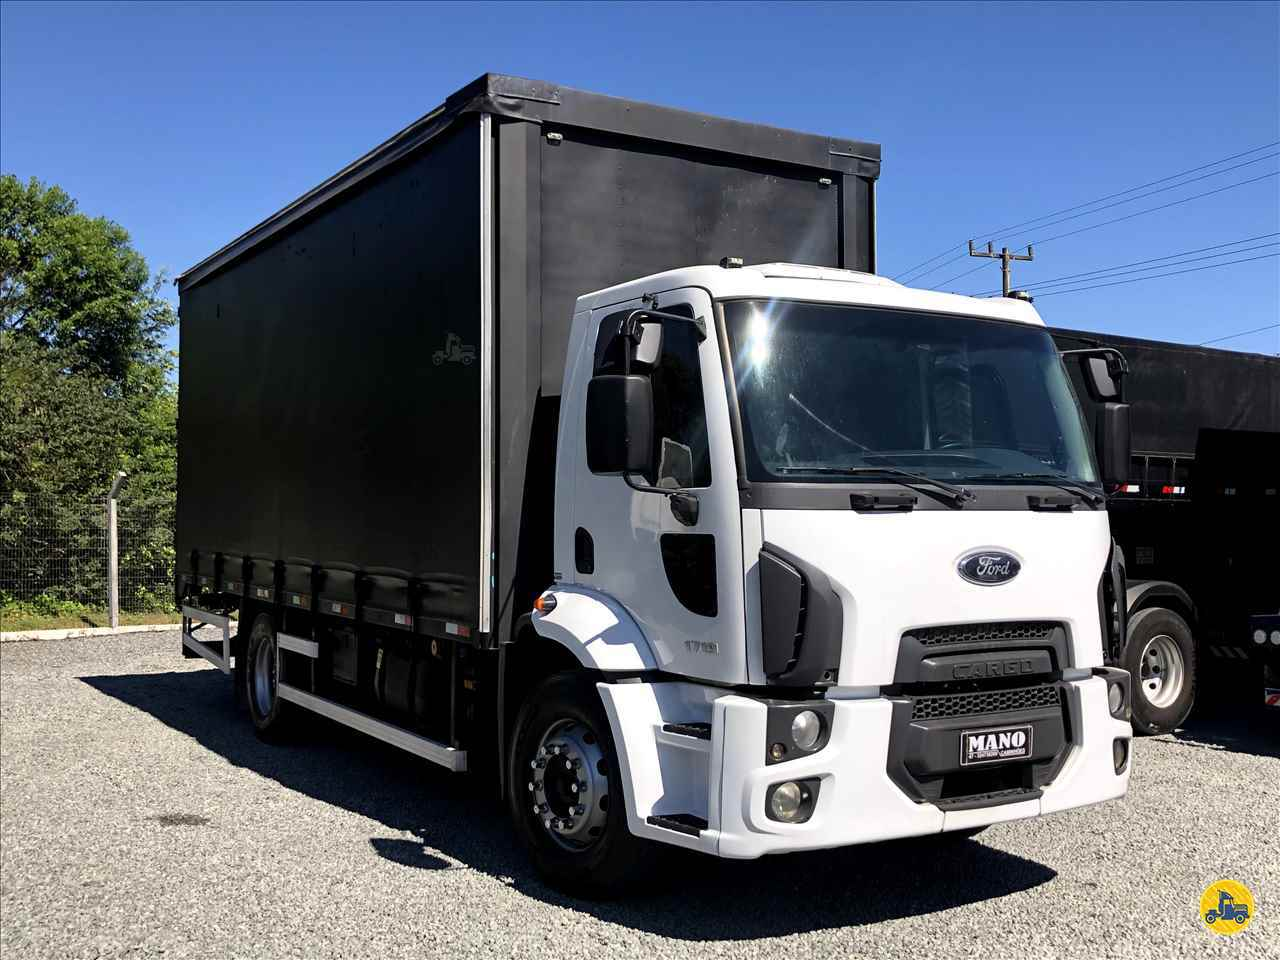 CARGO 1719 de Mano Caminhões - JOINVILLE/SC